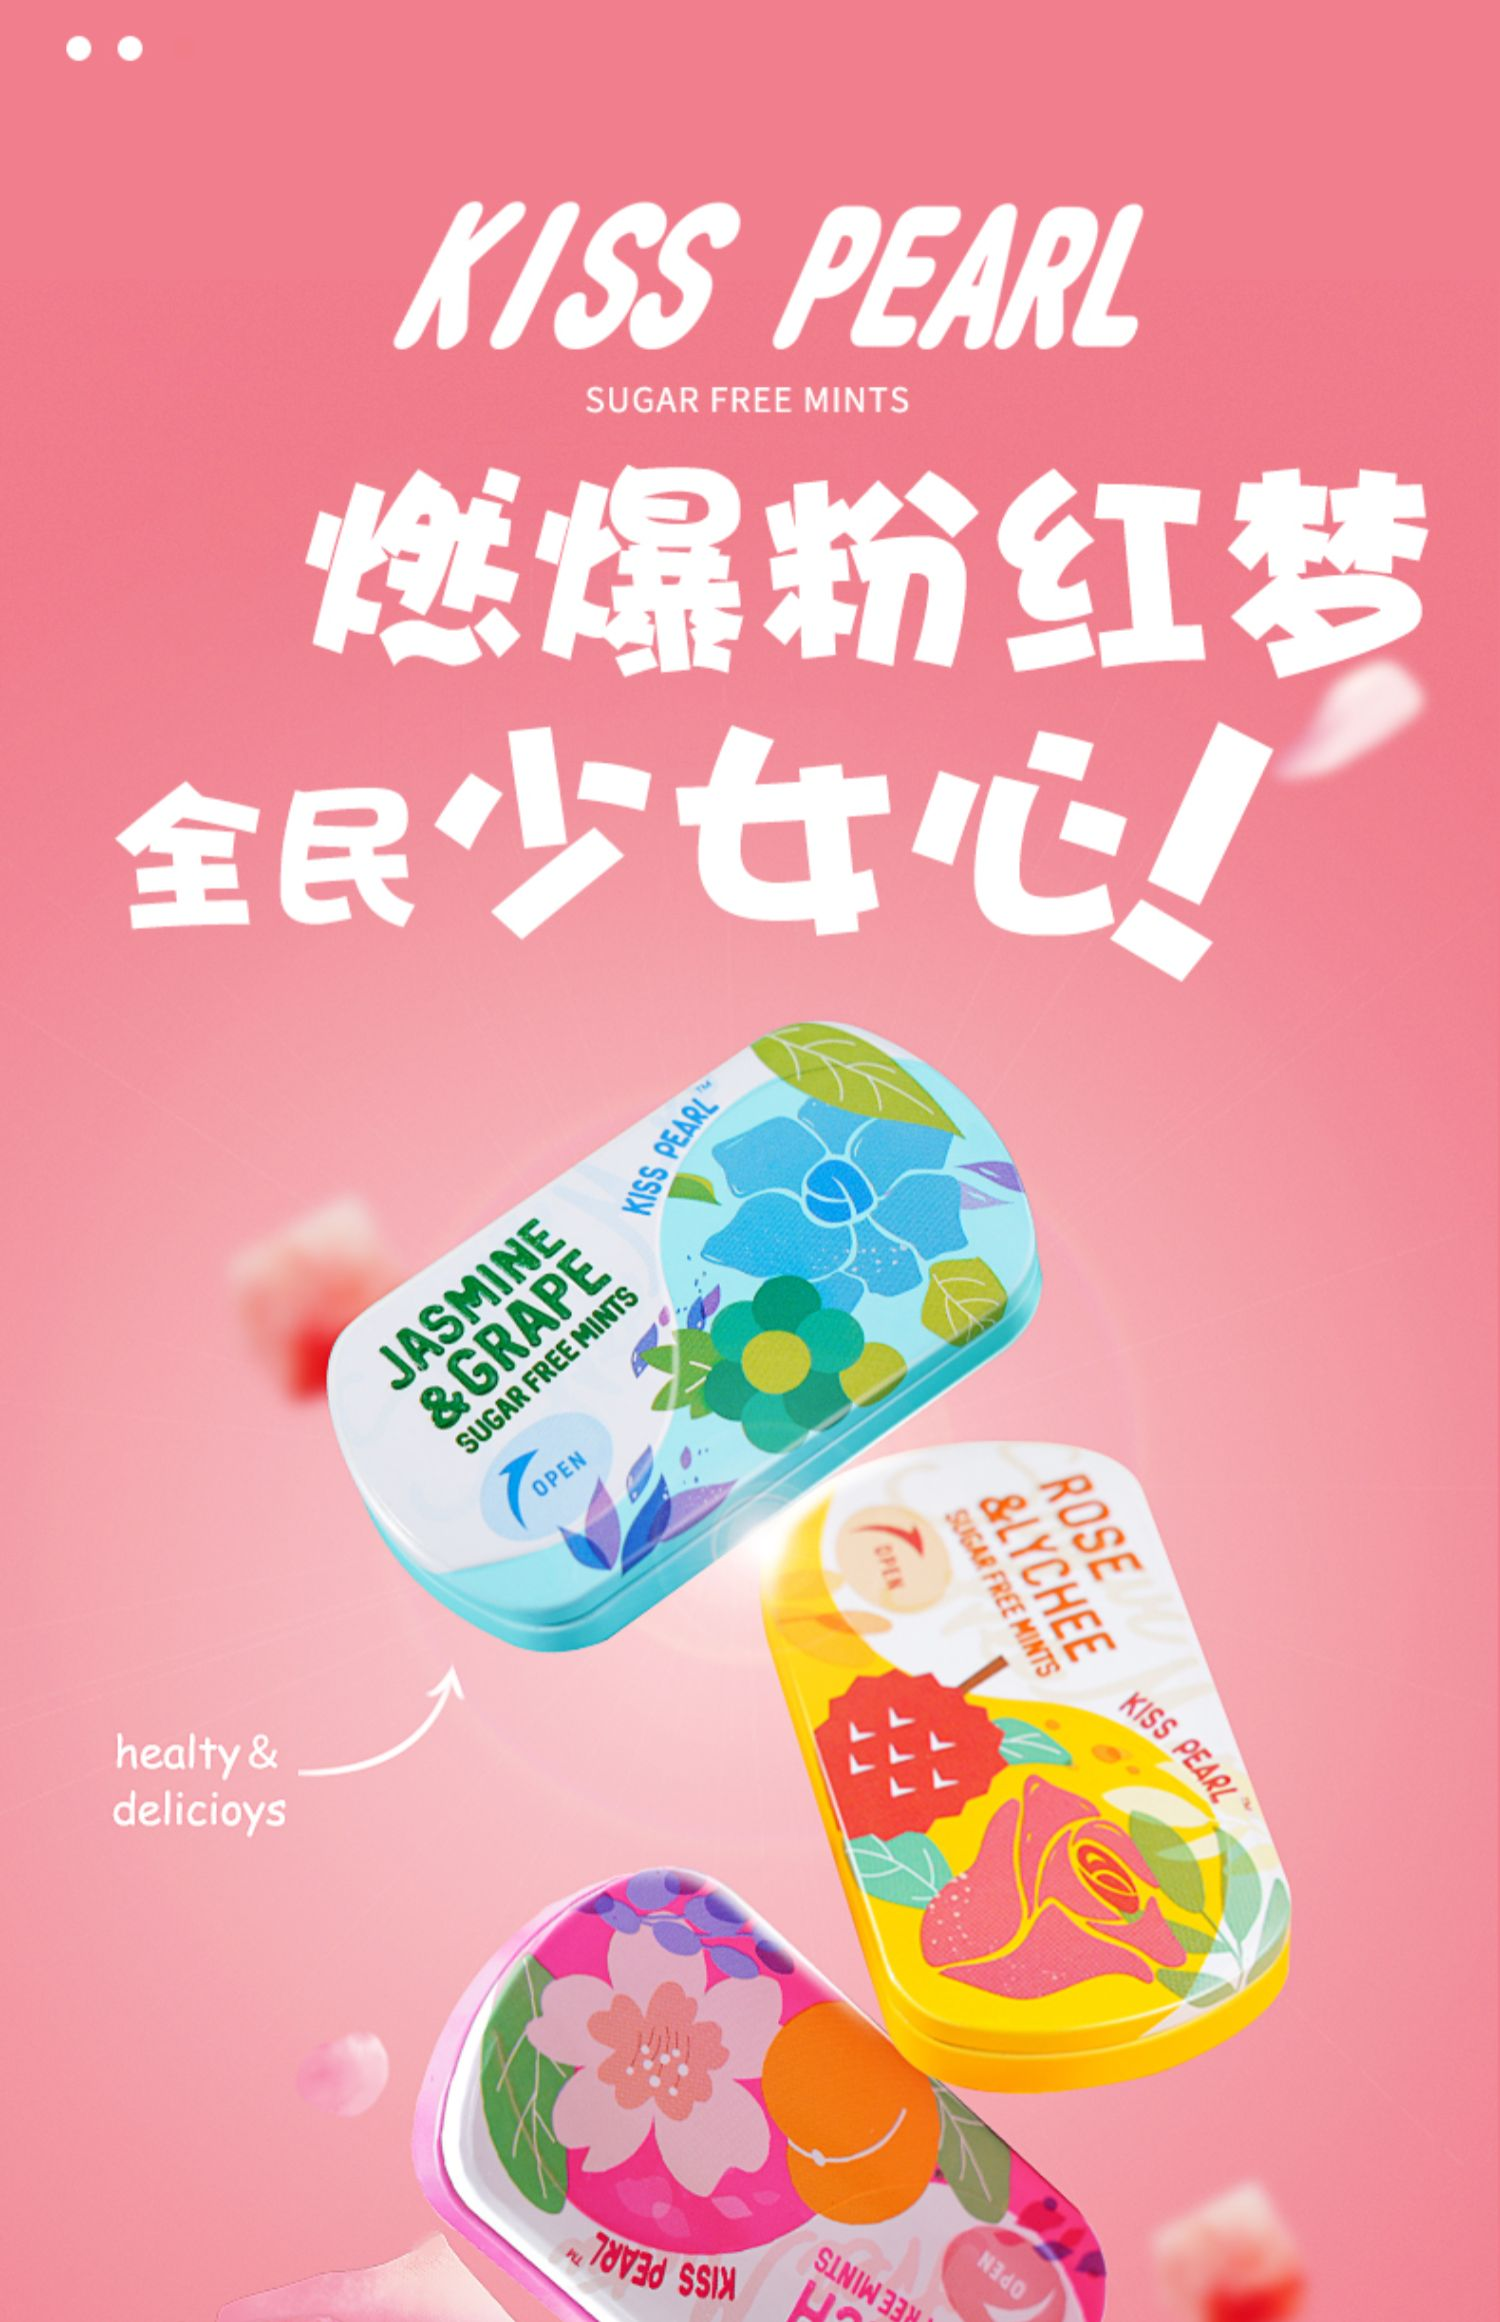 【IMINT】无糖薄荷糖口香糖6盒